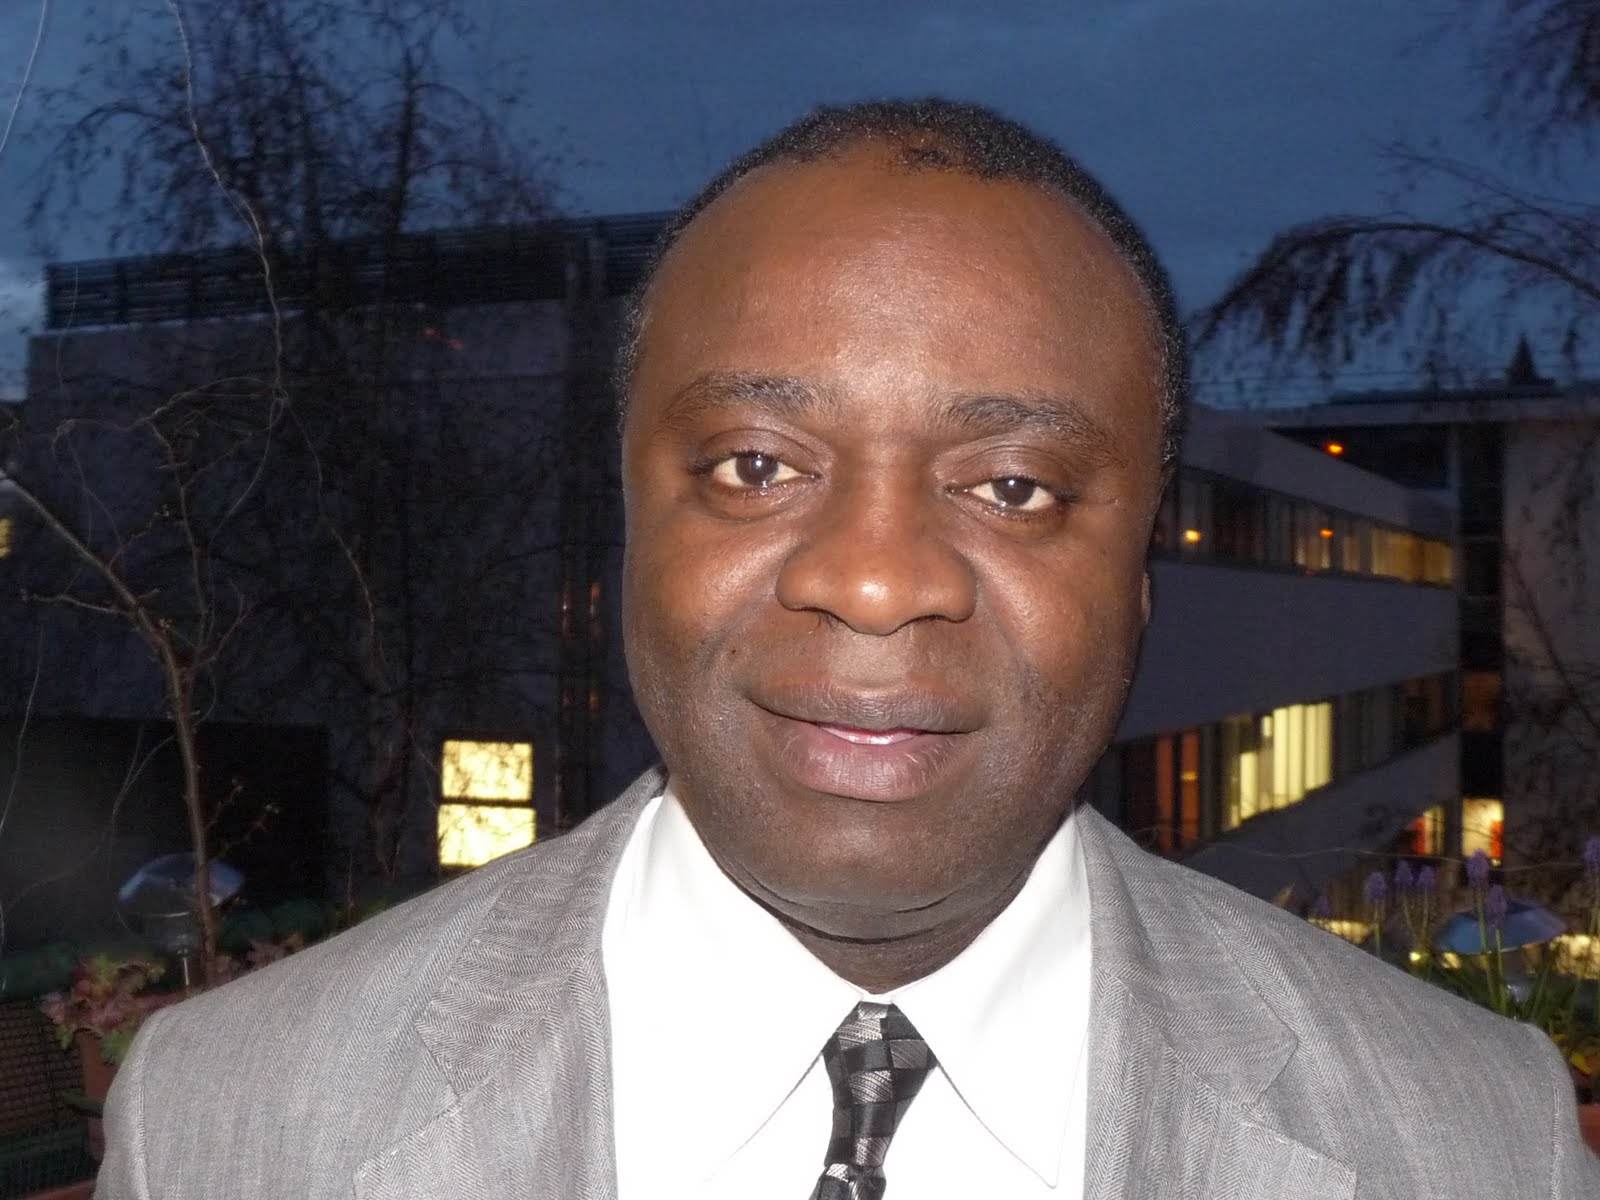 Cinq questions à Gaspard-Hubert Lonsi Koko